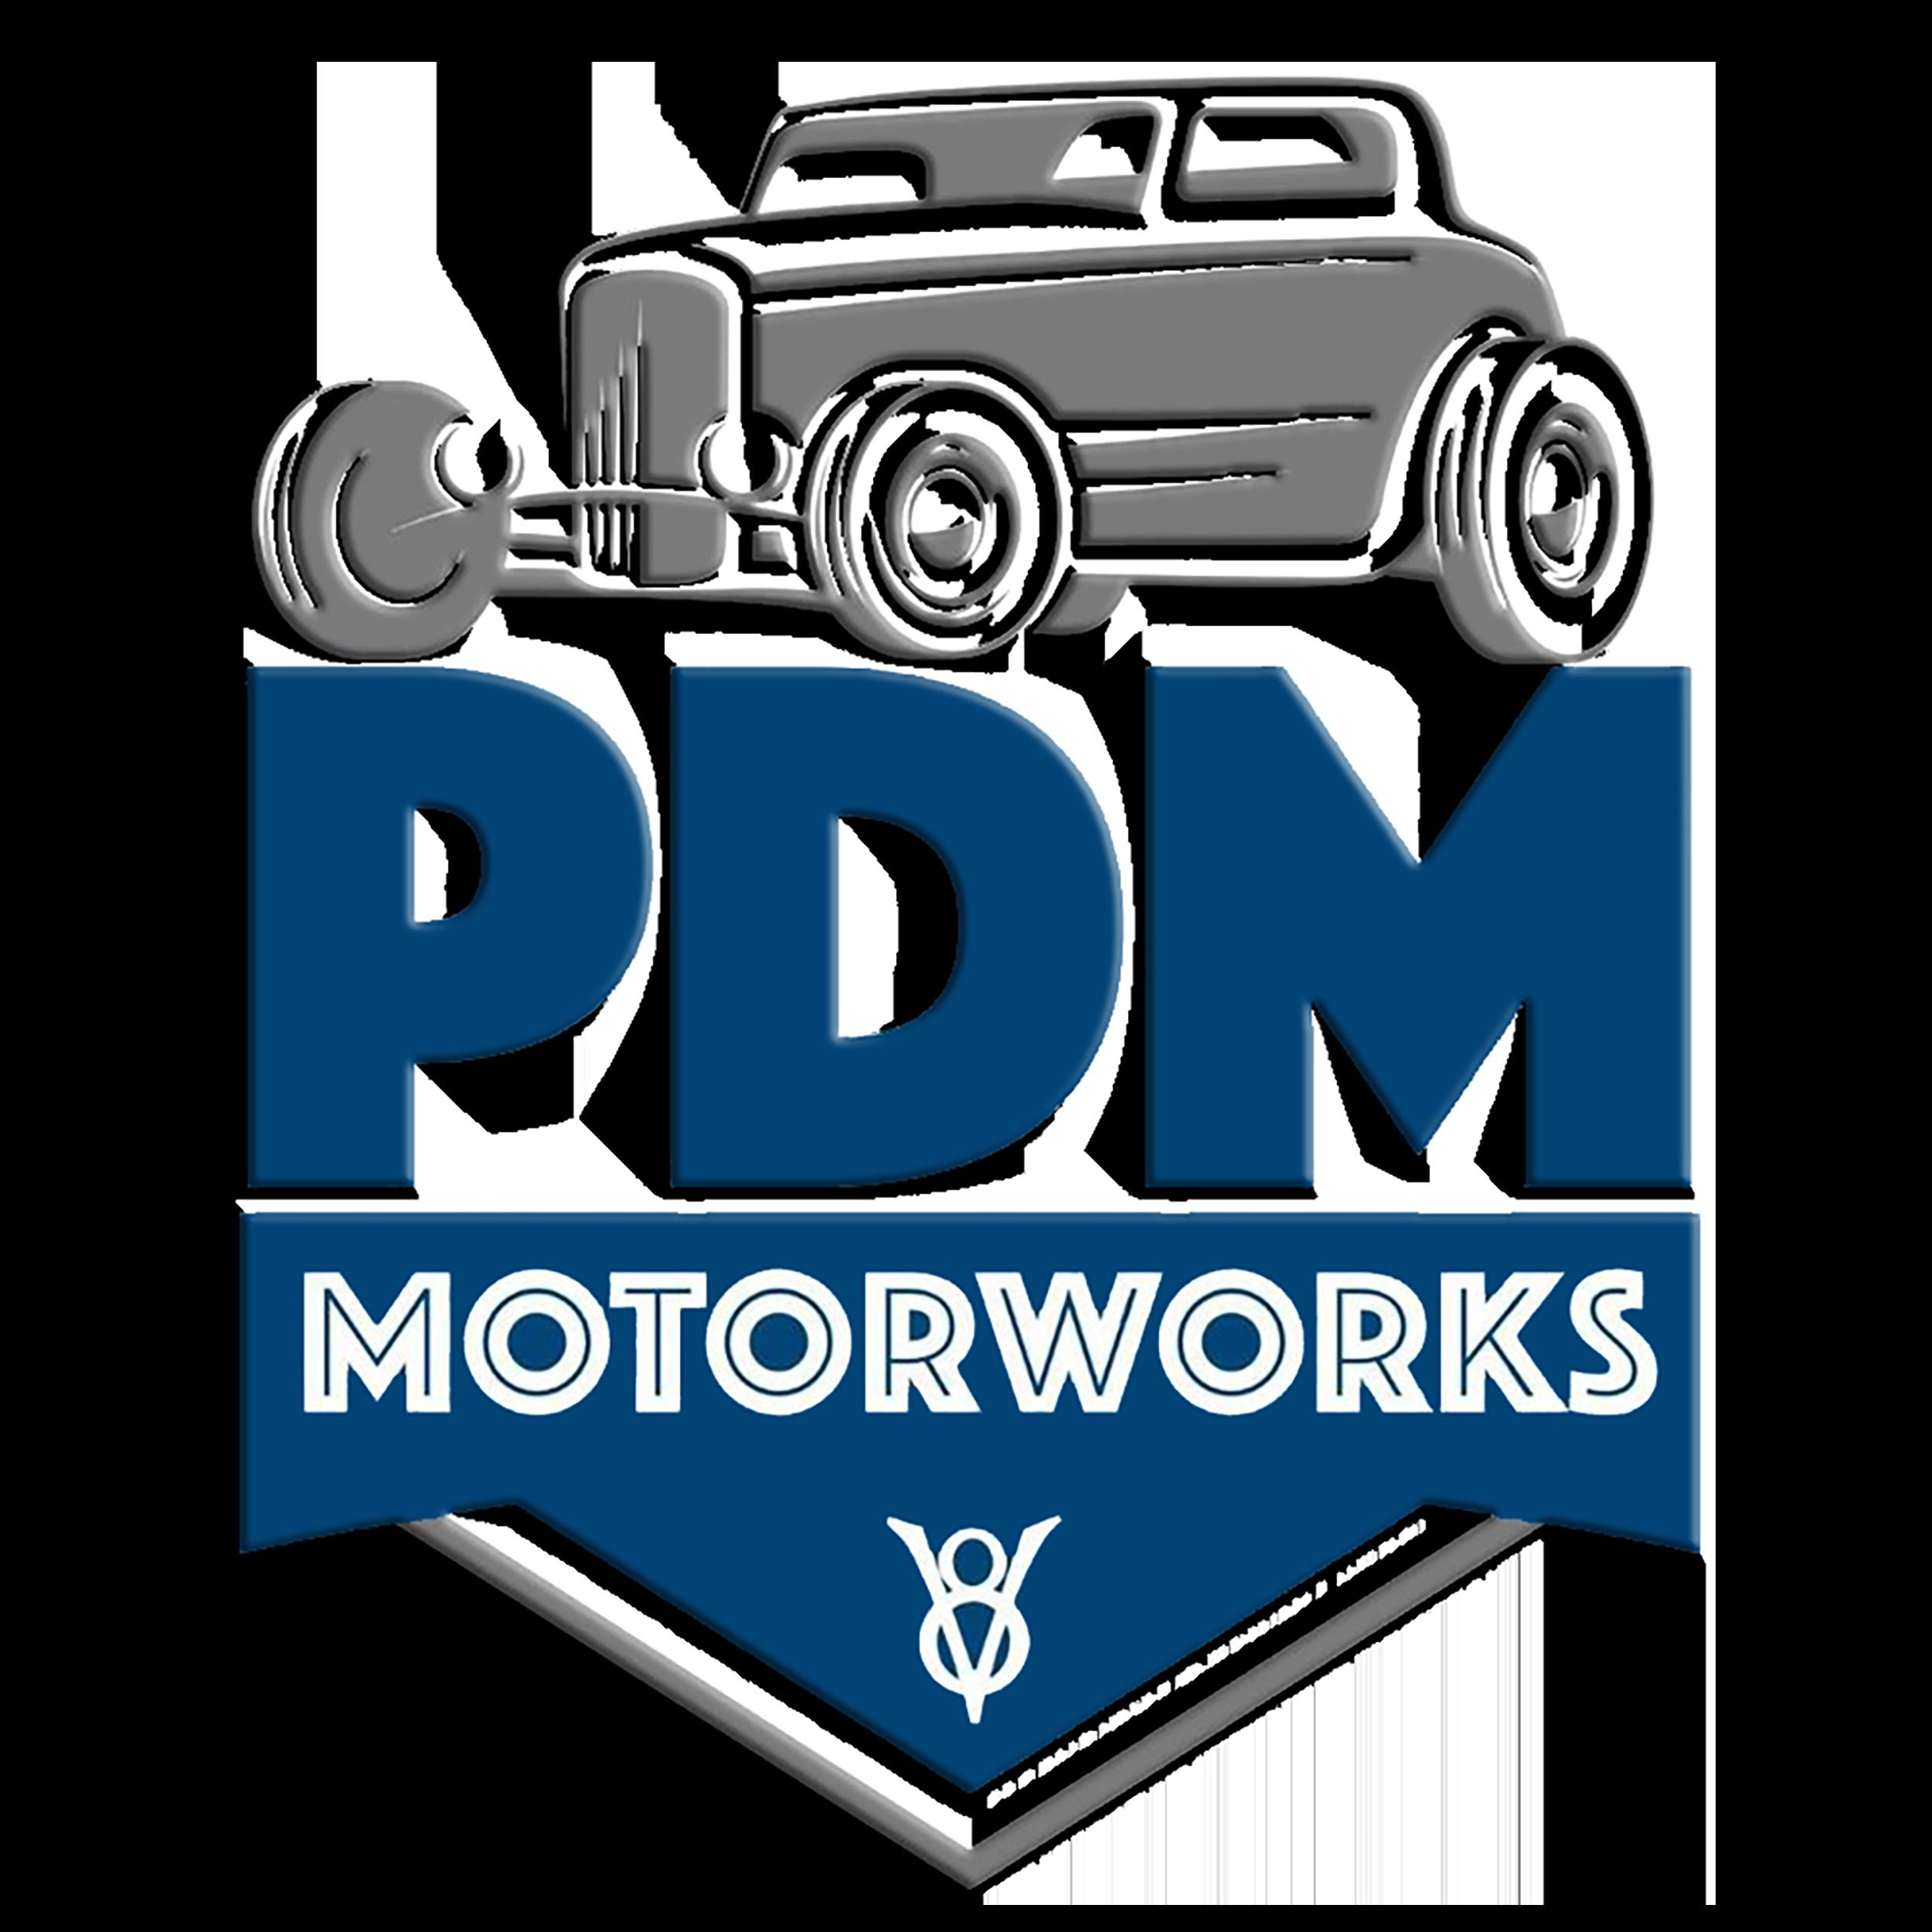 PDM Motorworks